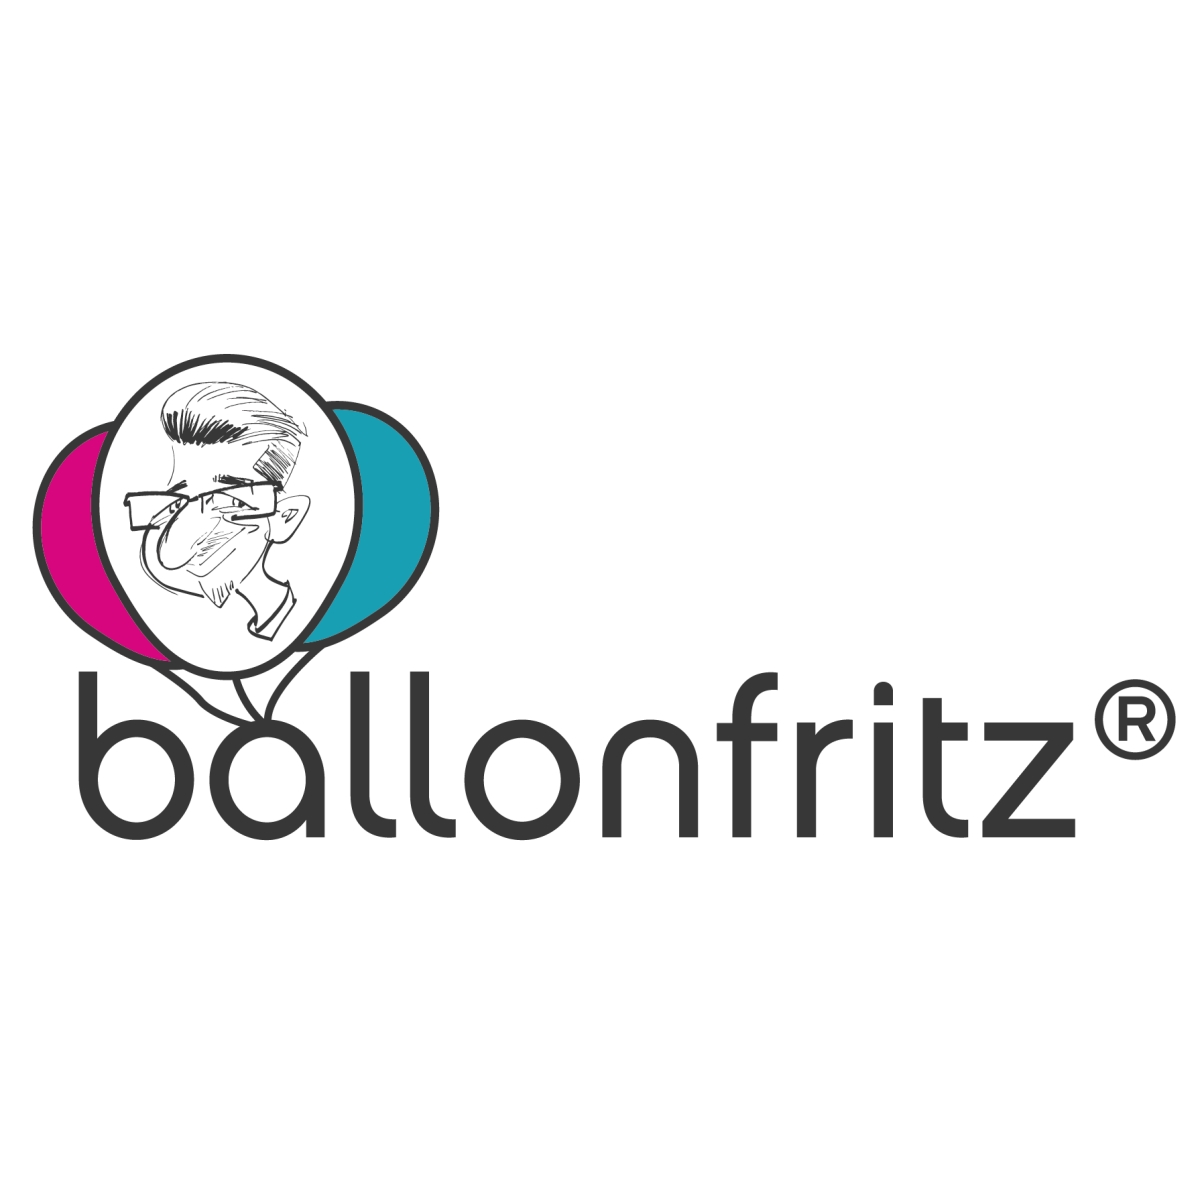 ballonFritz_logo_profil_white